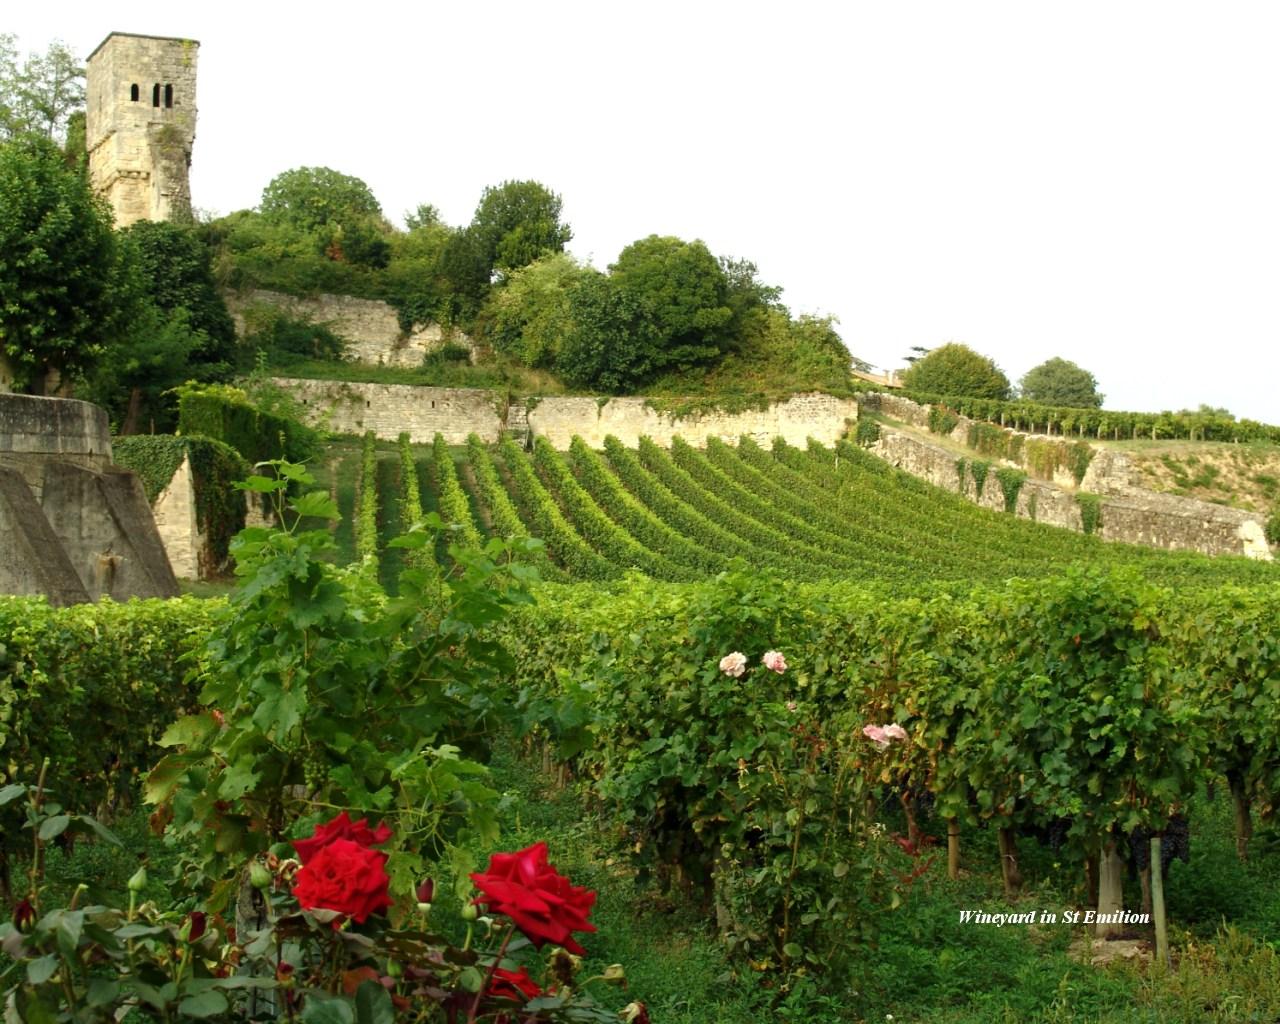 Wineyard in St Emilion